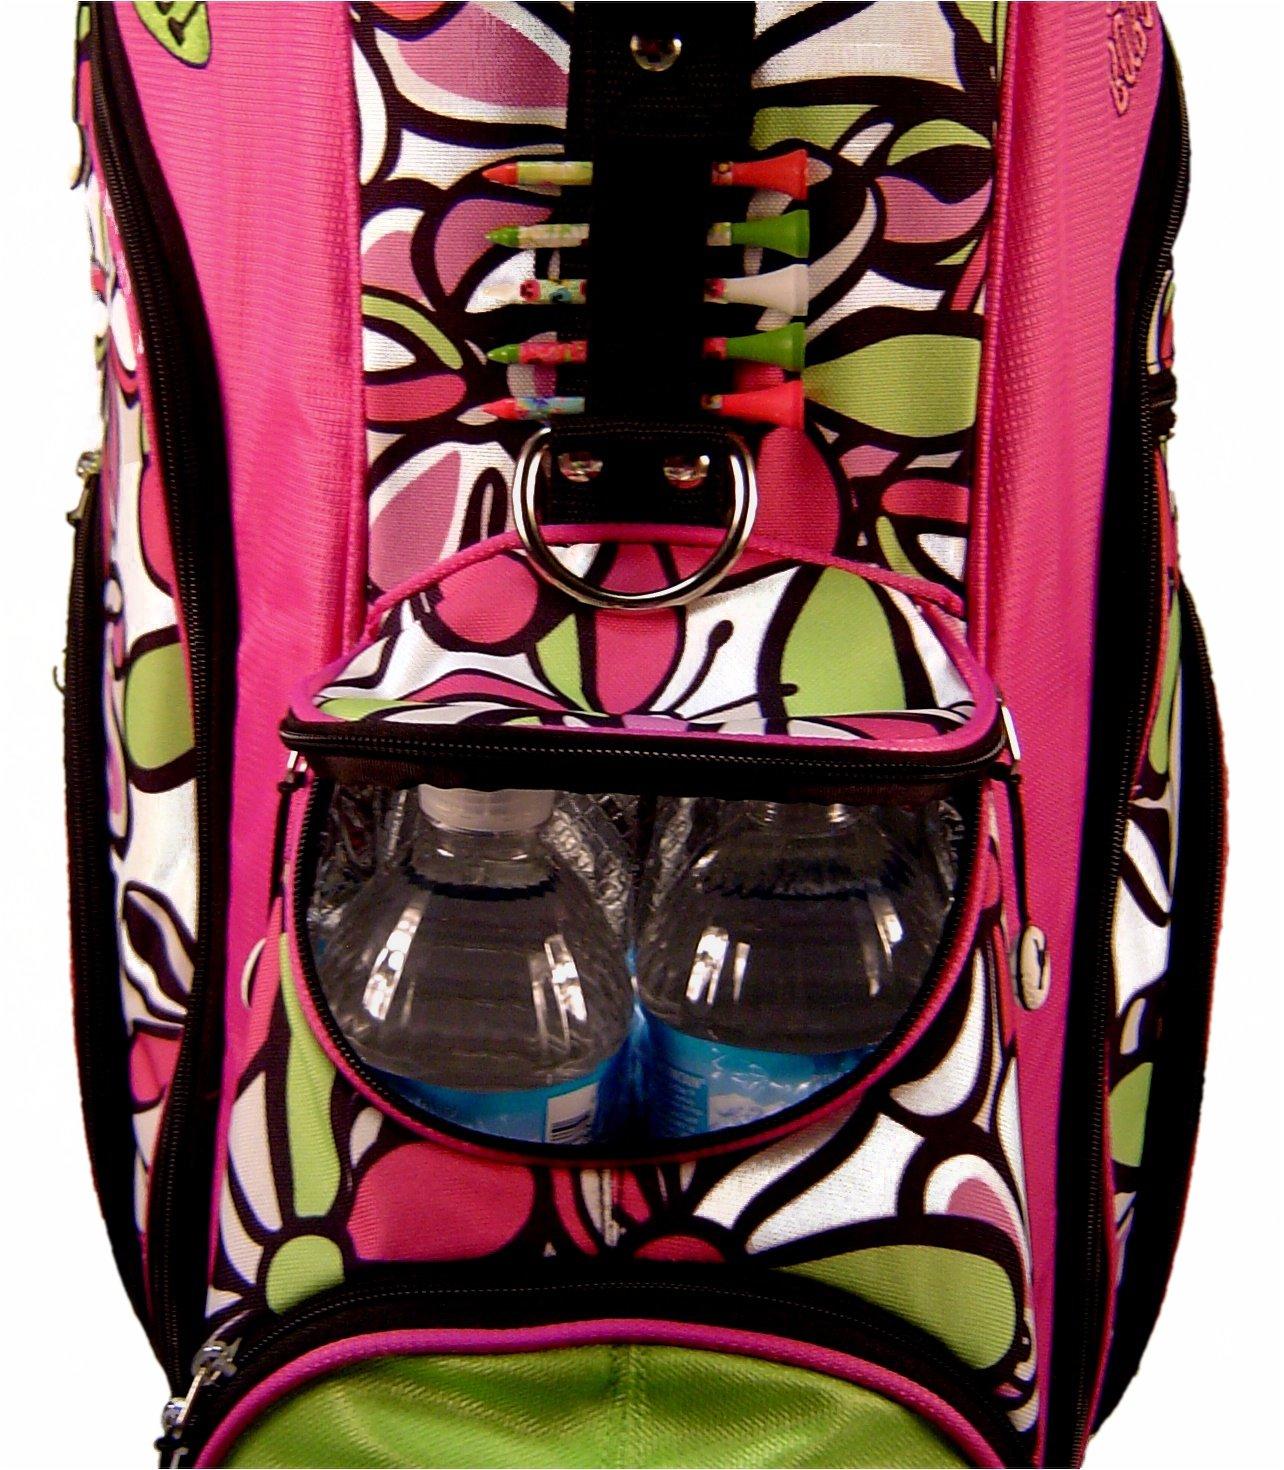 Birdie Babe Women Golf Bag Bahama Mama Pink Flowered Ladies Hybrid Golf Bag